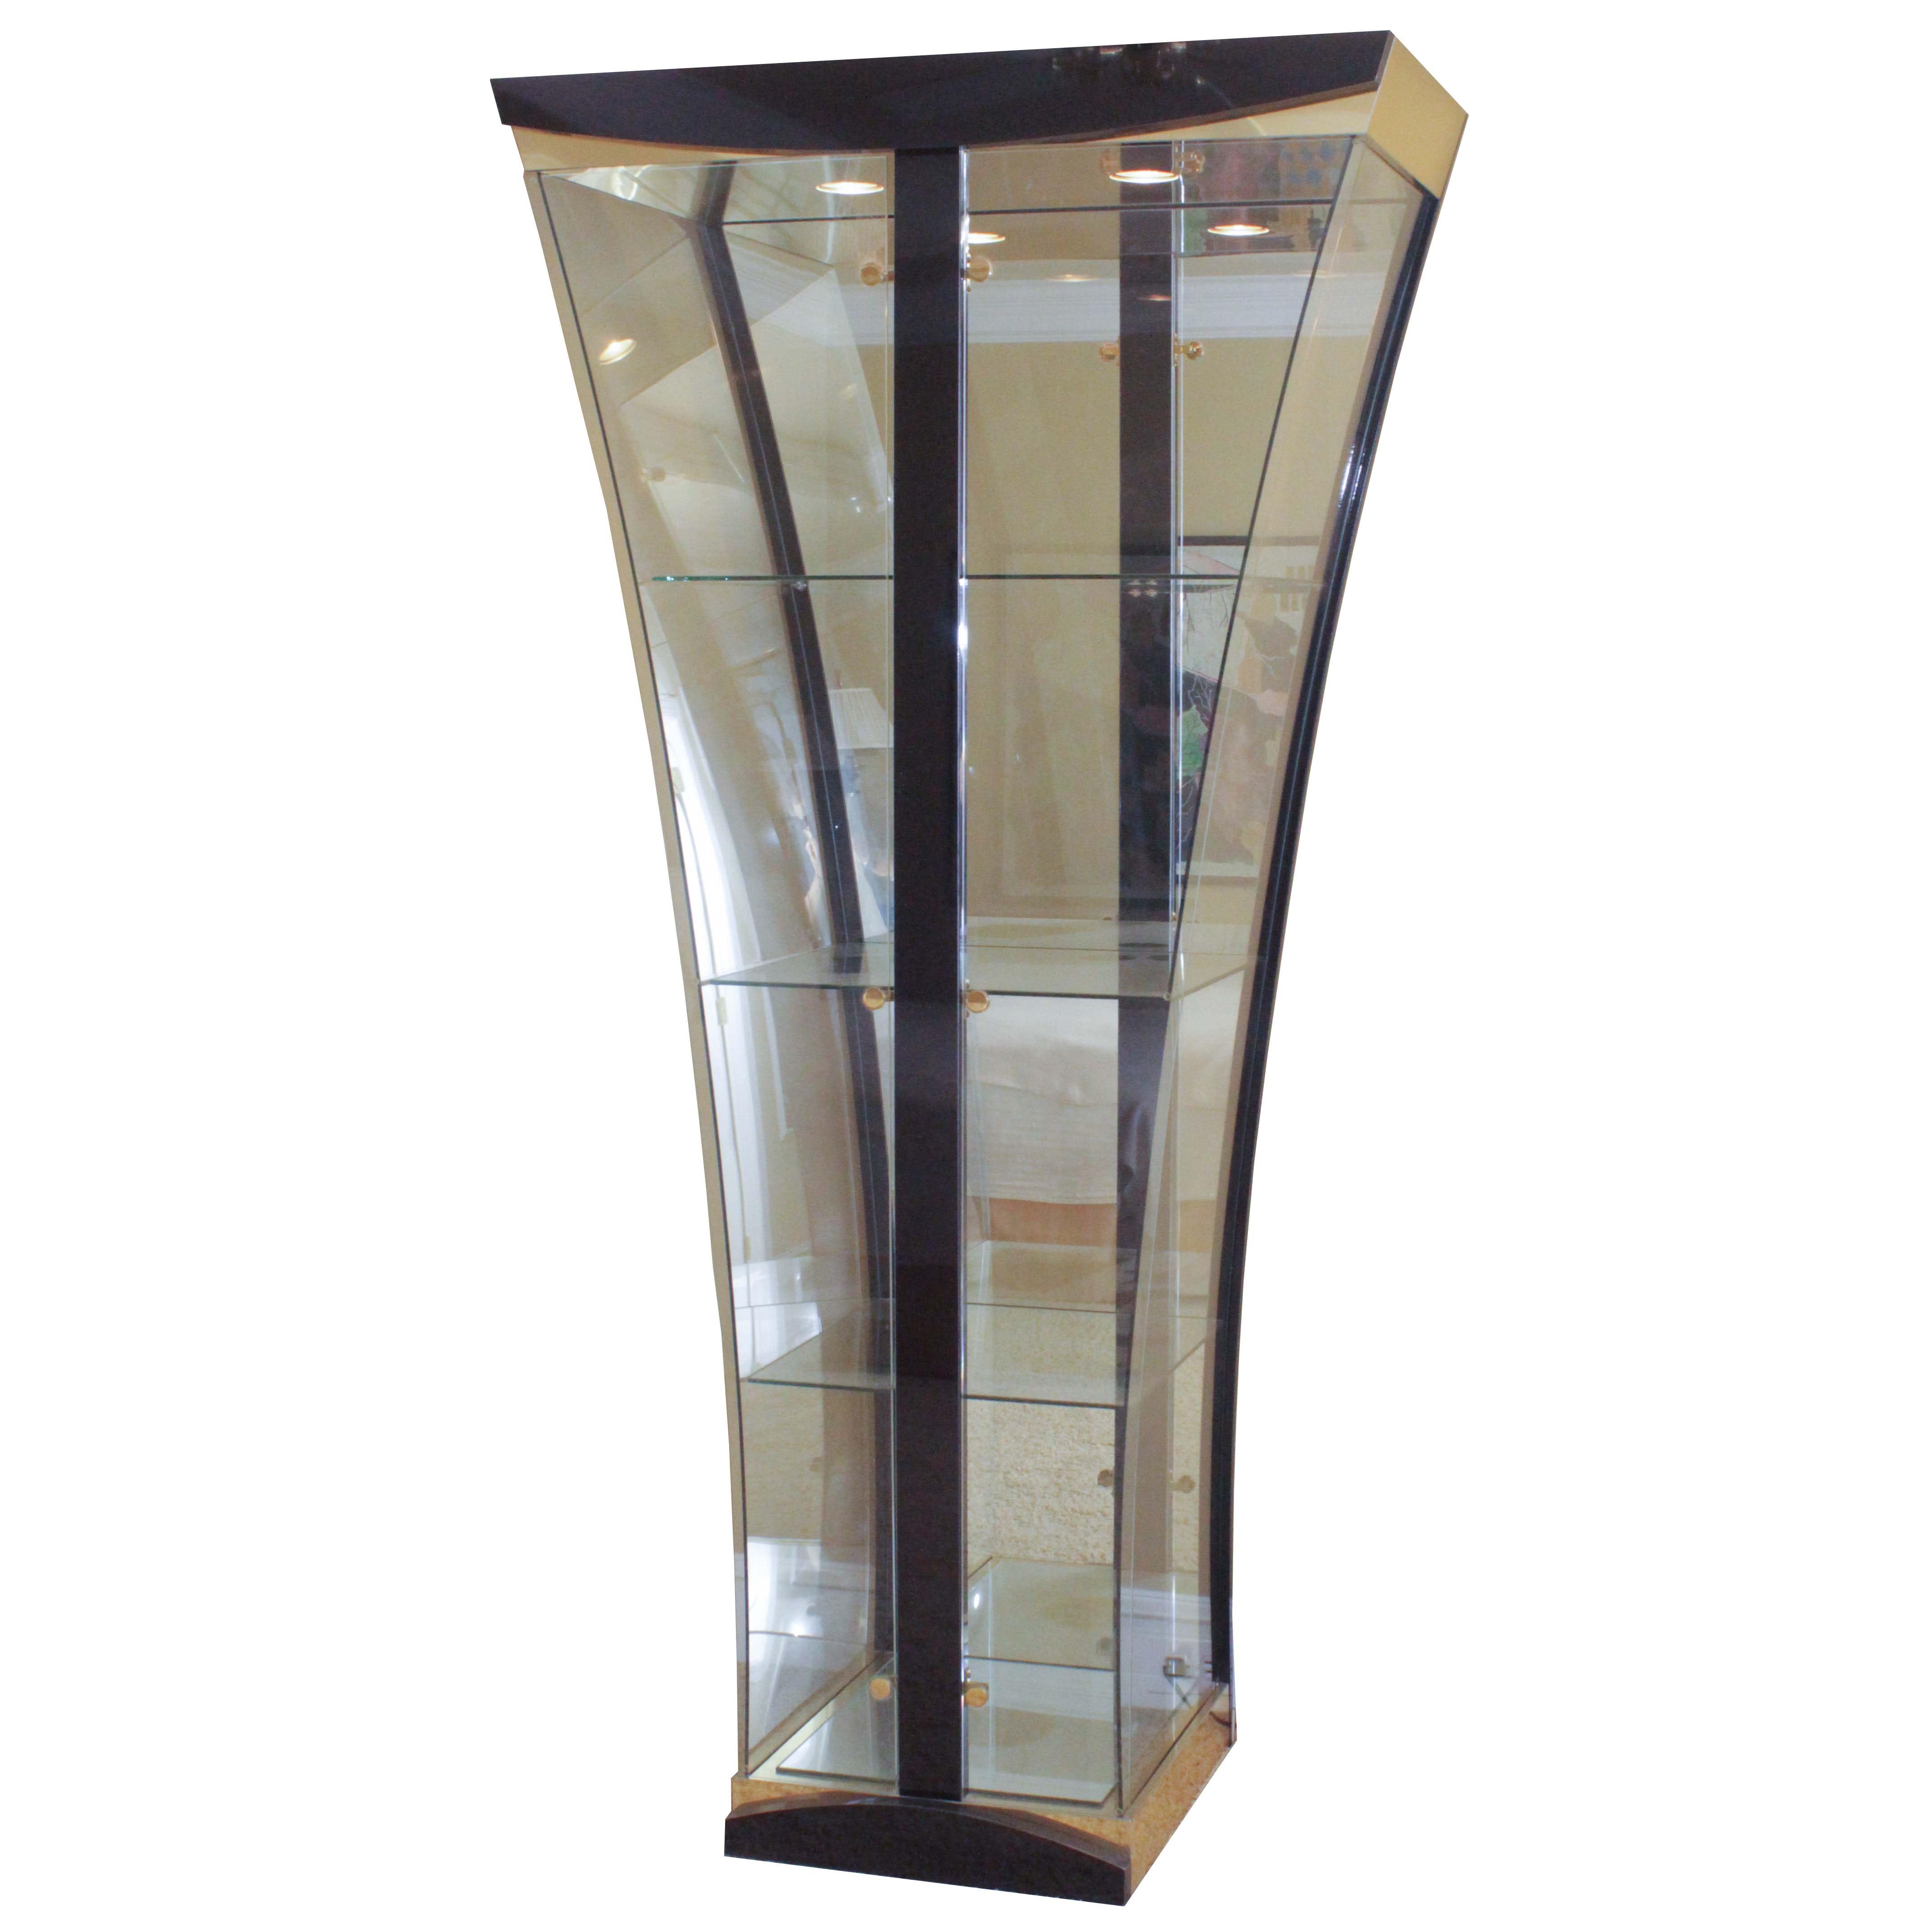 Illuminated Glass Display Cabinet